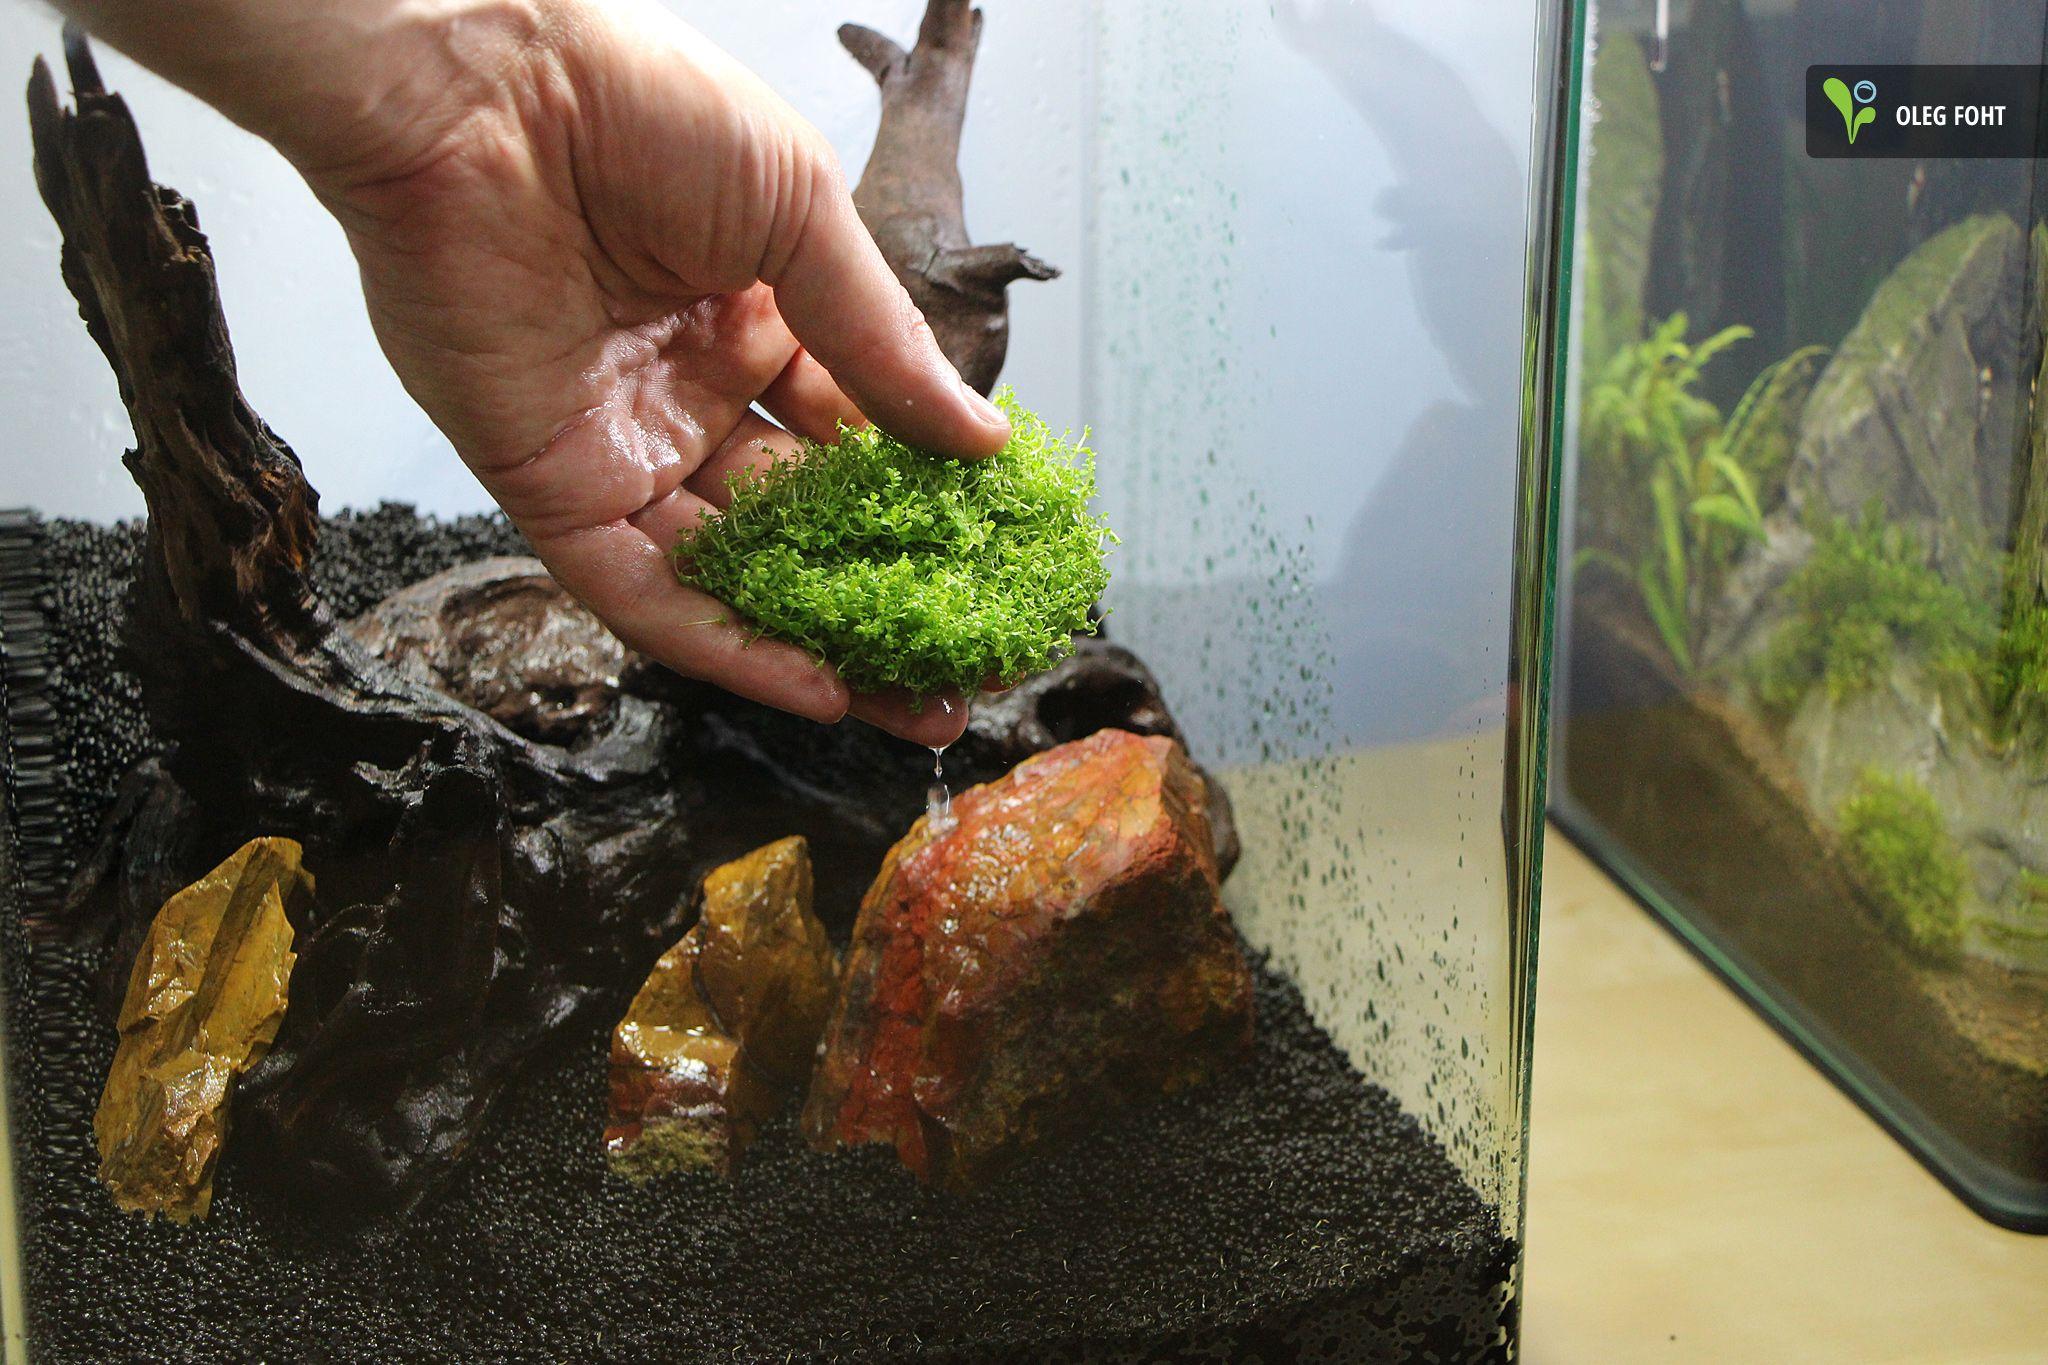 work in progress 30l nano aquarium hemianthus. Black Bedroom Furniture Sets. Home Design Ideas